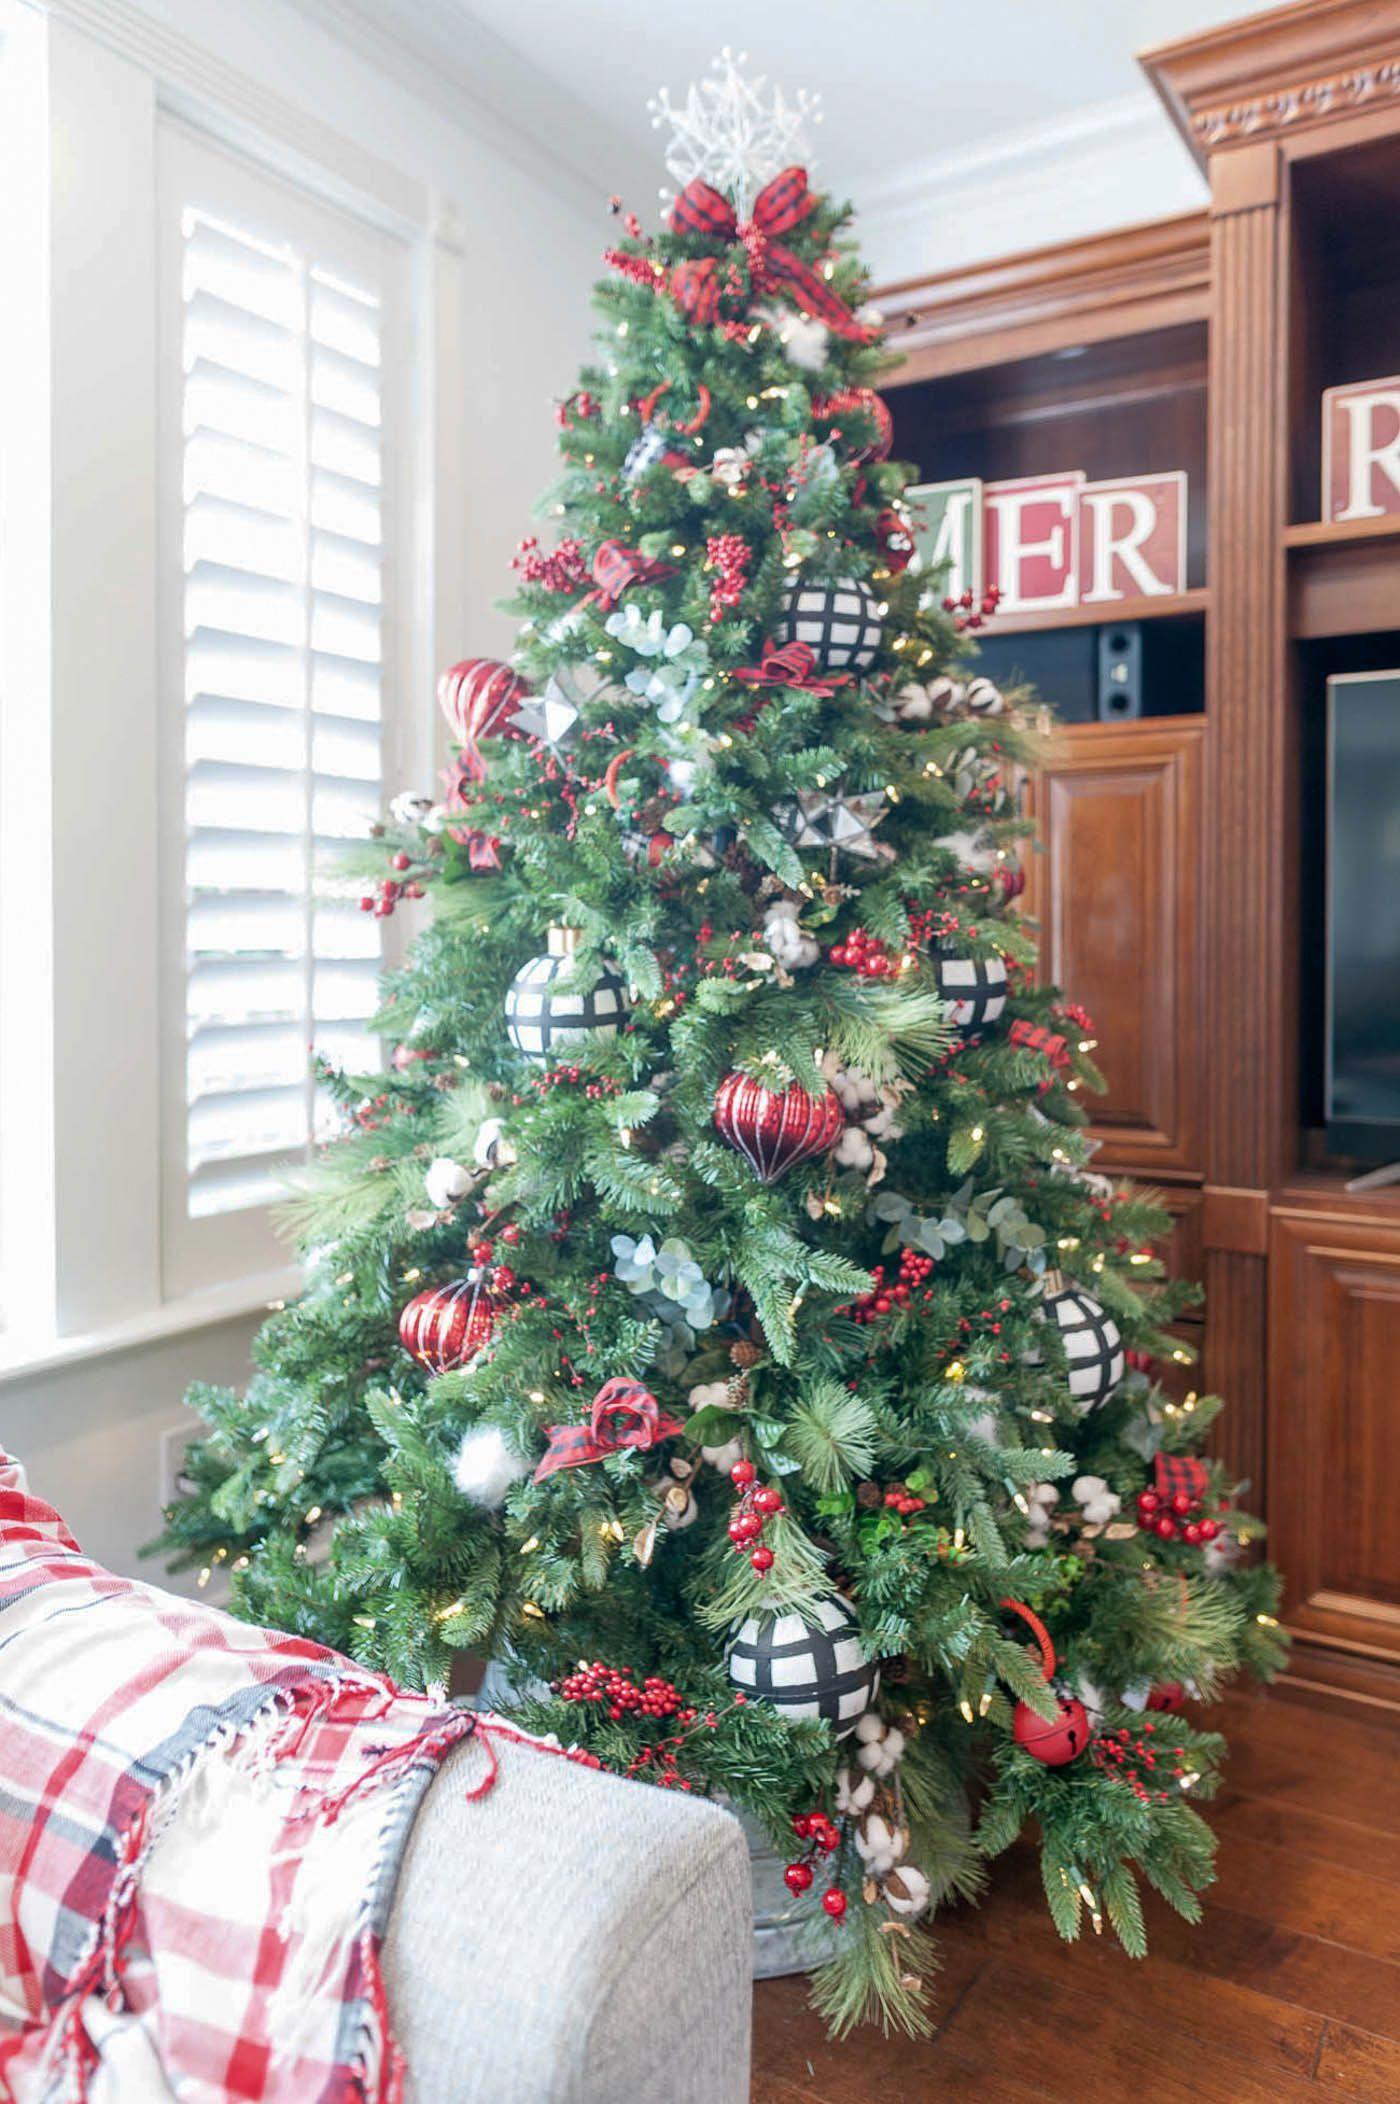 Christmas Tree Decorations Harrods Green Christmas Tree Colorful Christmas Tree Green Christmas